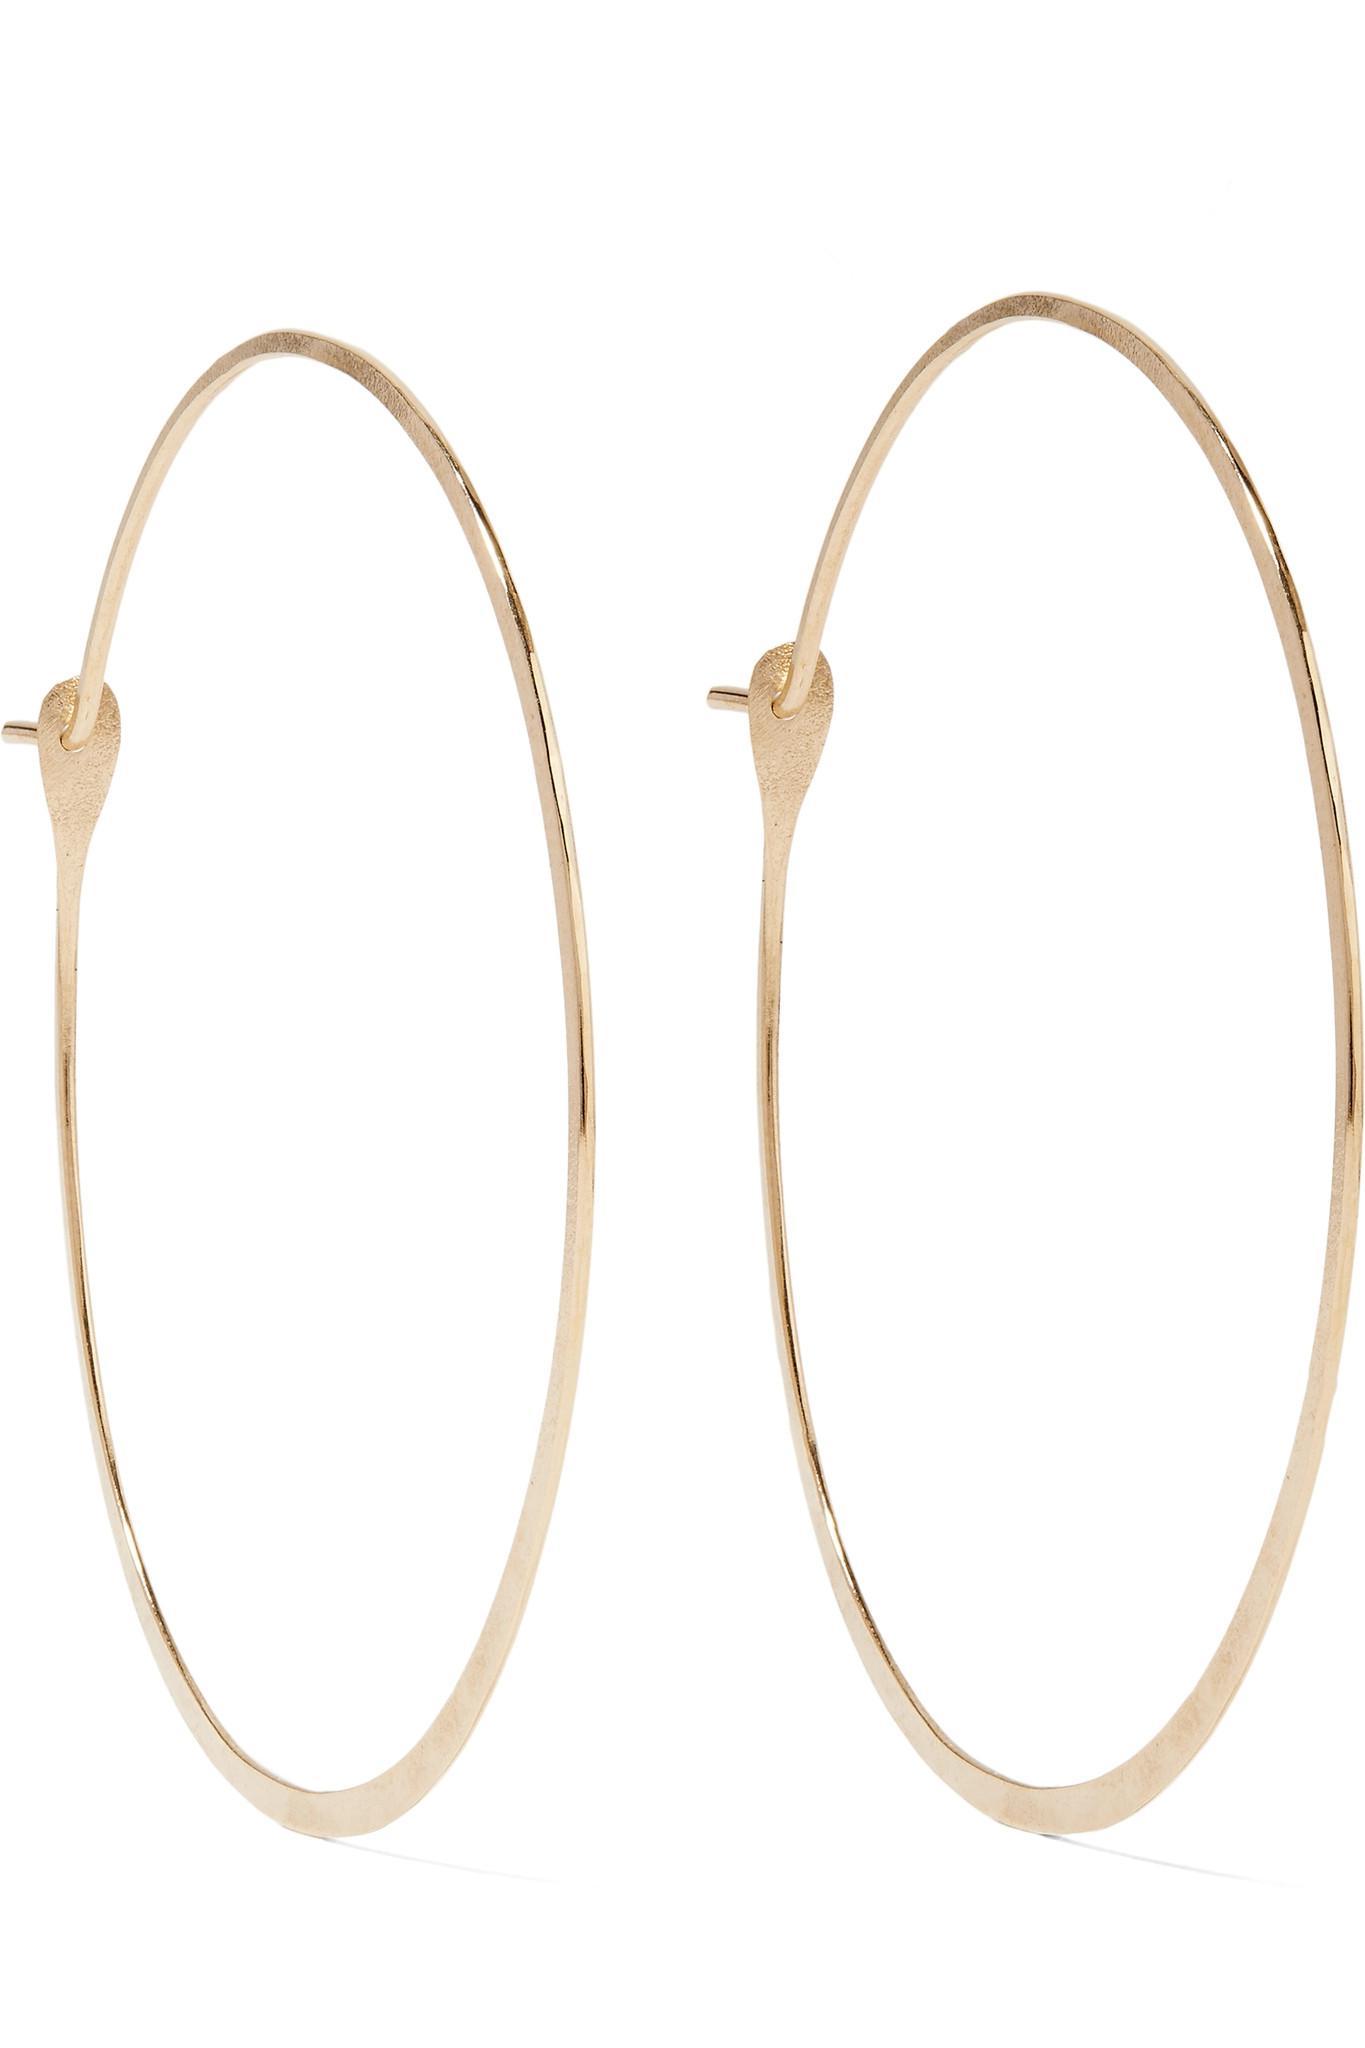 Melissa Joy Manning 14-karat Gold Multi-stone Hoop Earrings 66RwSIWV